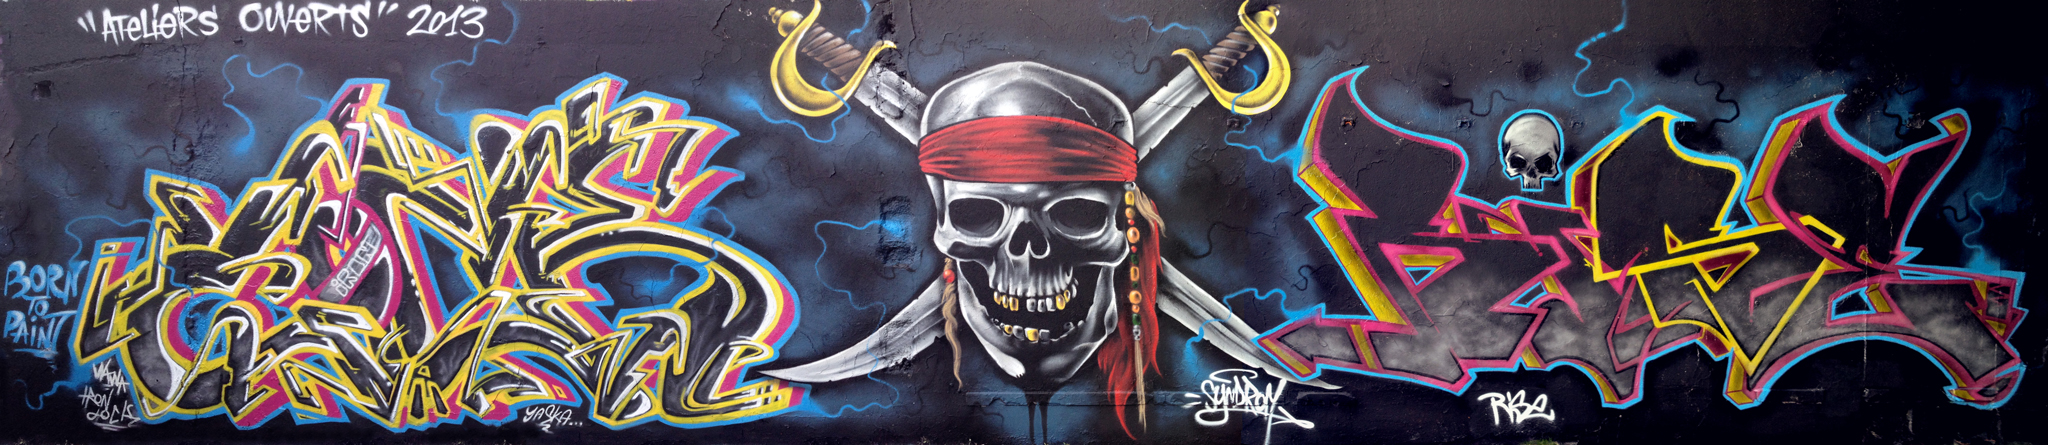 graffiti-larochelle-legabut